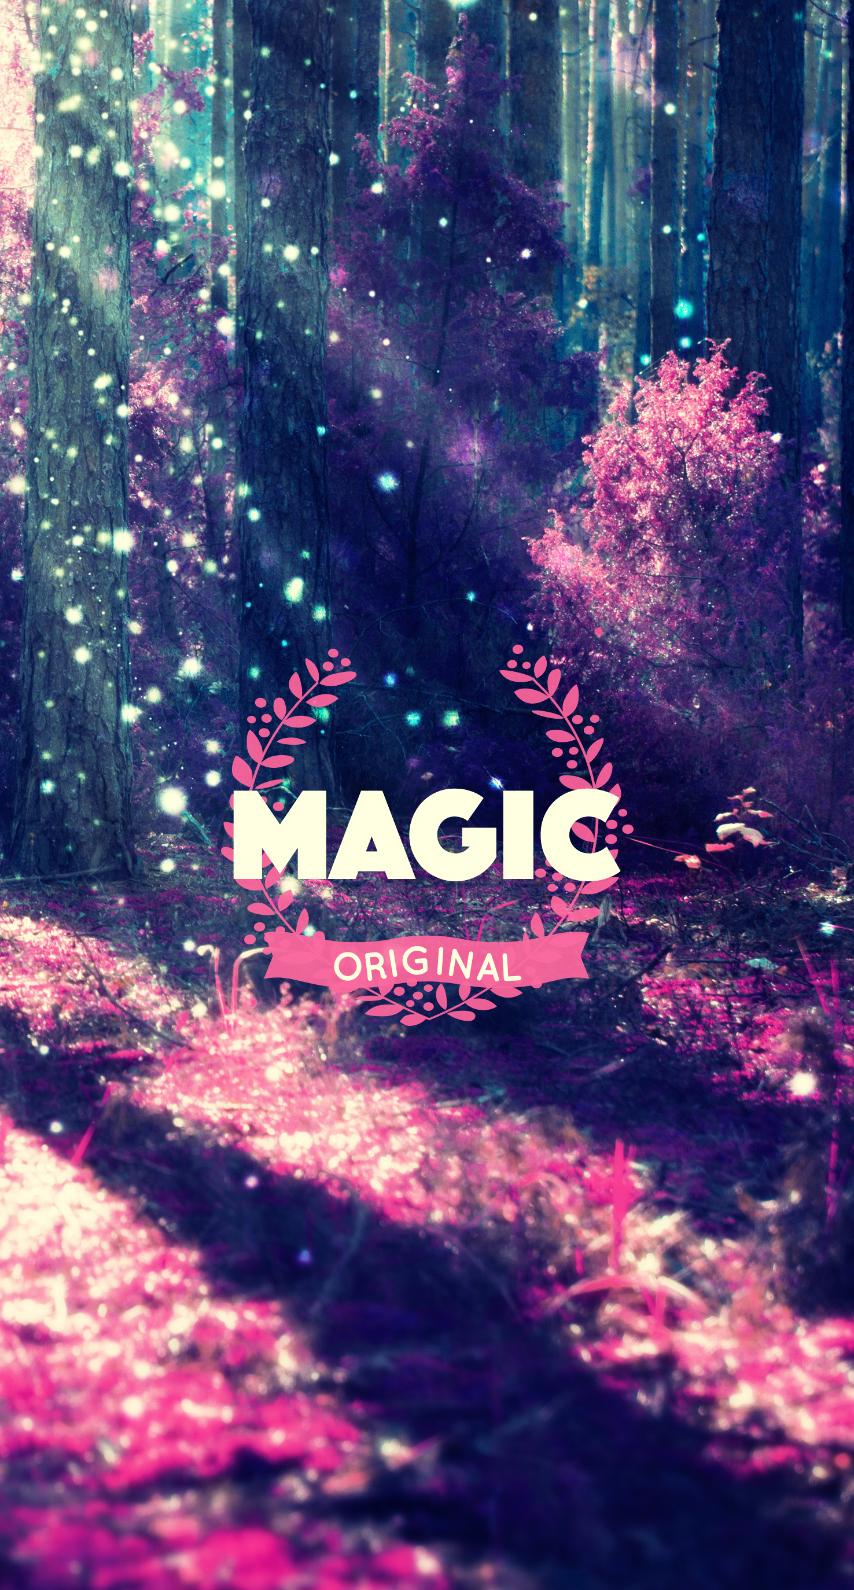 bright, fantasy, fog, design, motion, illustration, outdoors, creativity, square, illuminated